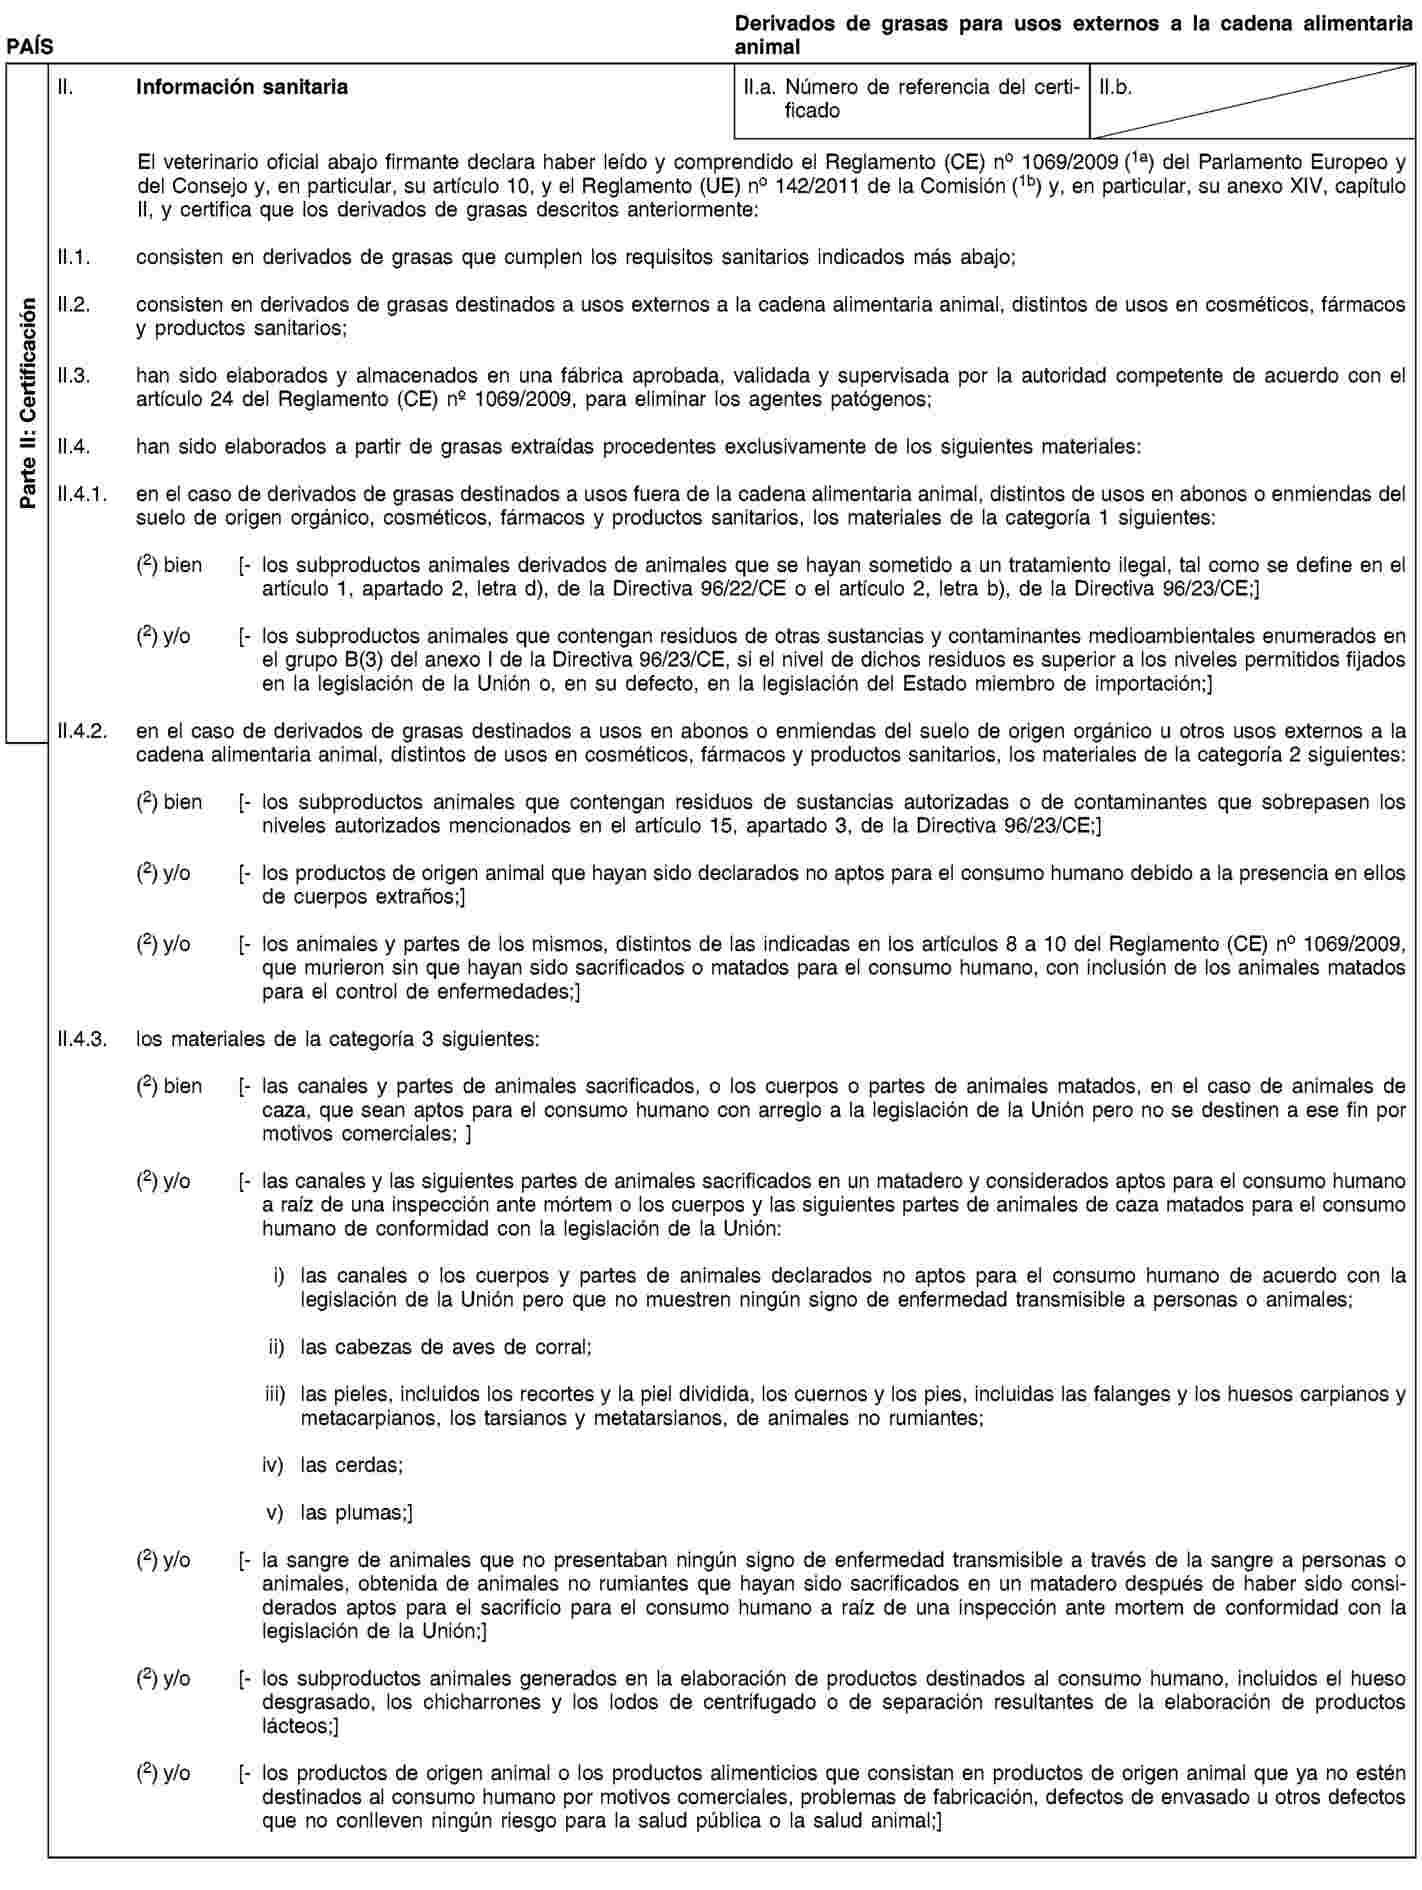 Imagen: https://eur-lex.europa.eu/resource.html?uri=uriserv:OJ.L_.2011.054.01.0001.01.SPA.xhtml.L_2011054ES.01022601.tif.jpg